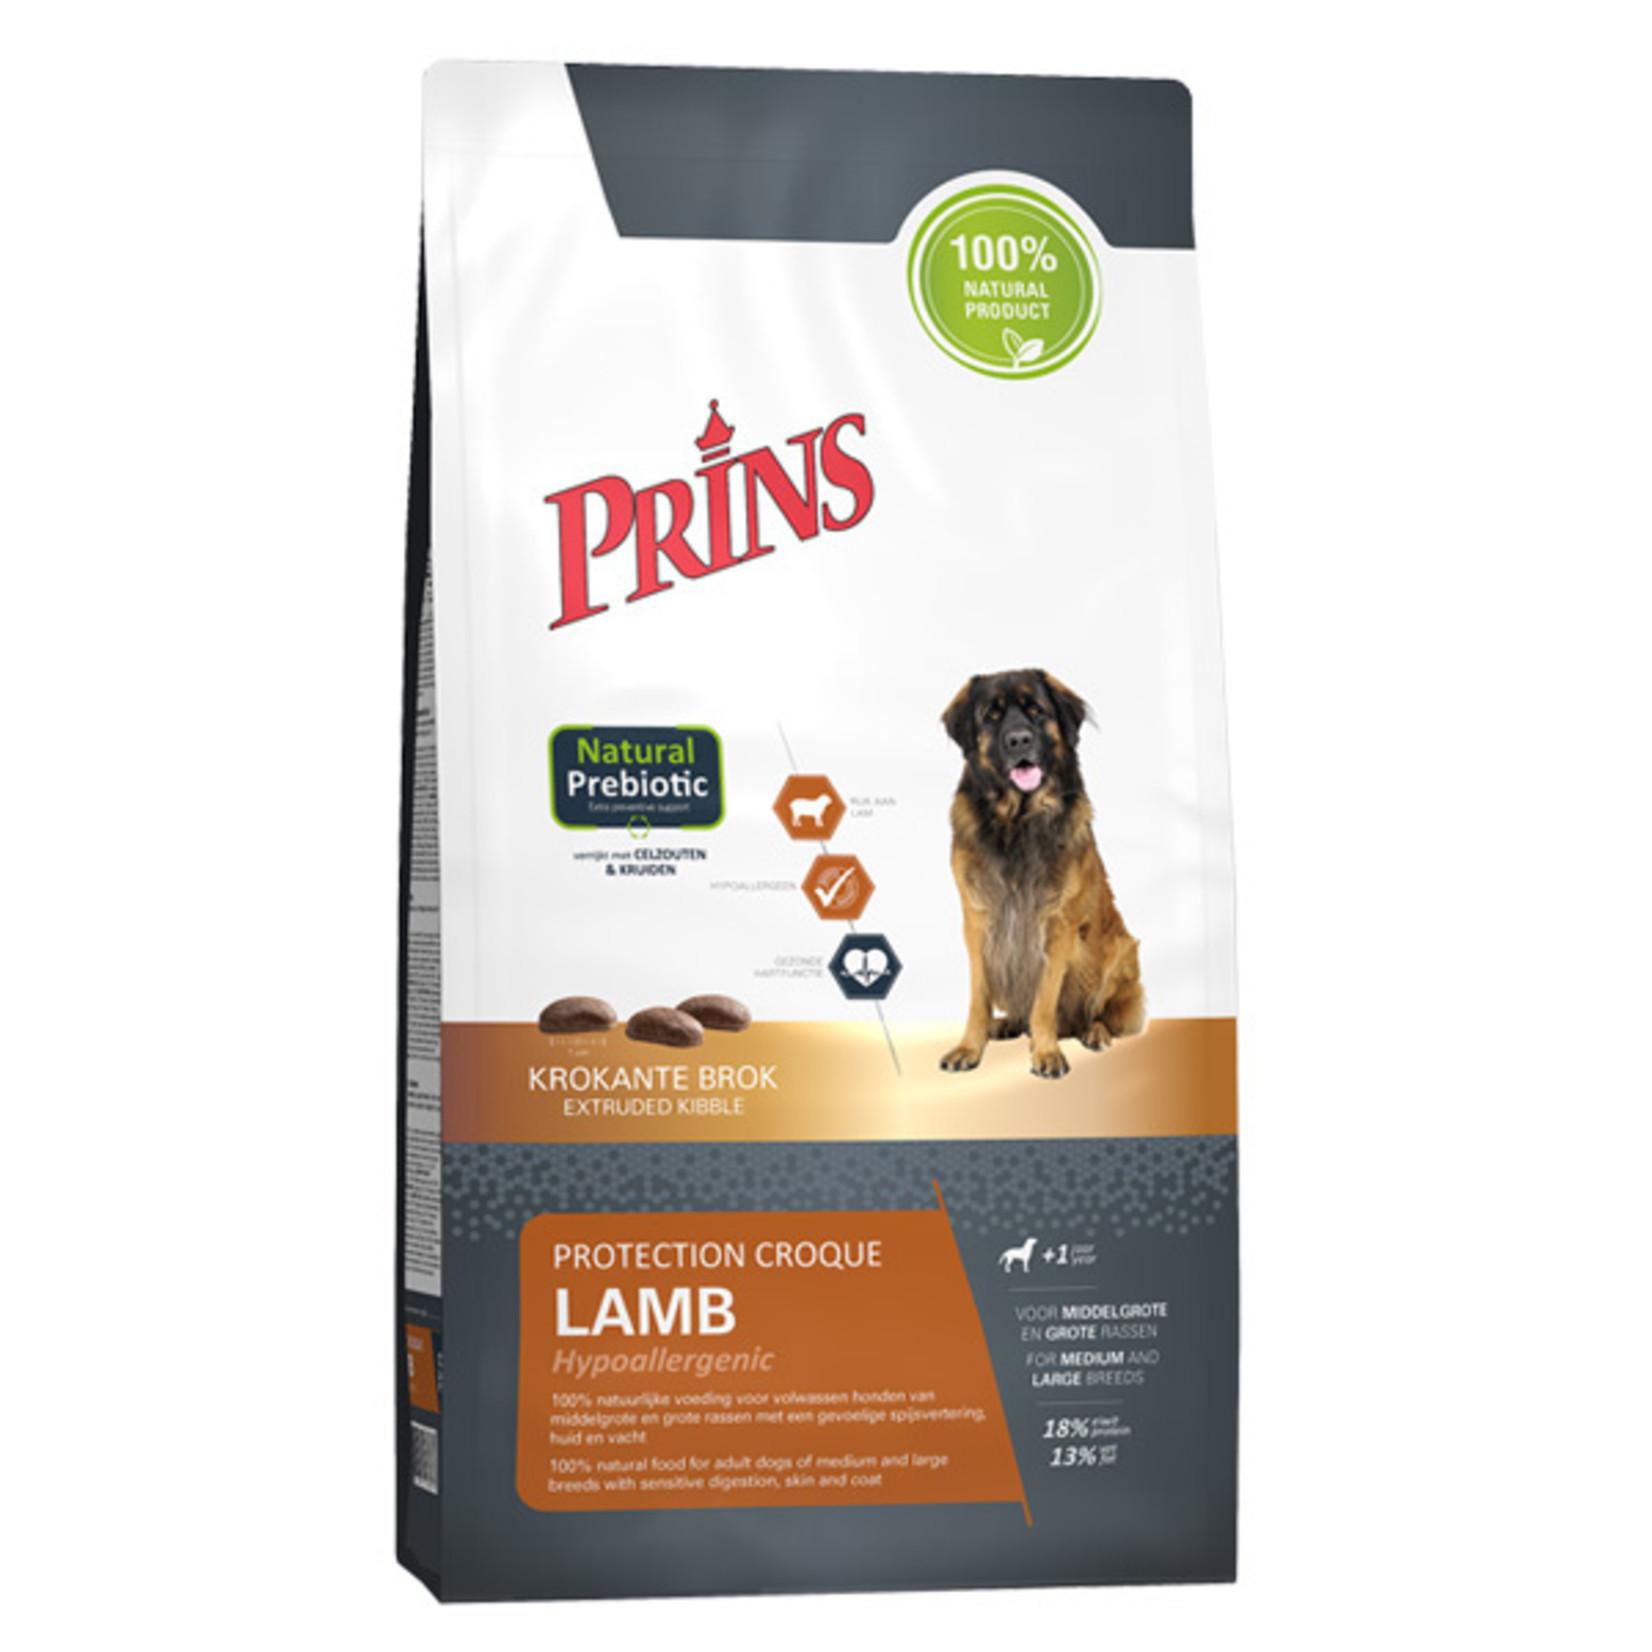 Prins Petfoods Prins Protection Lamb Croque